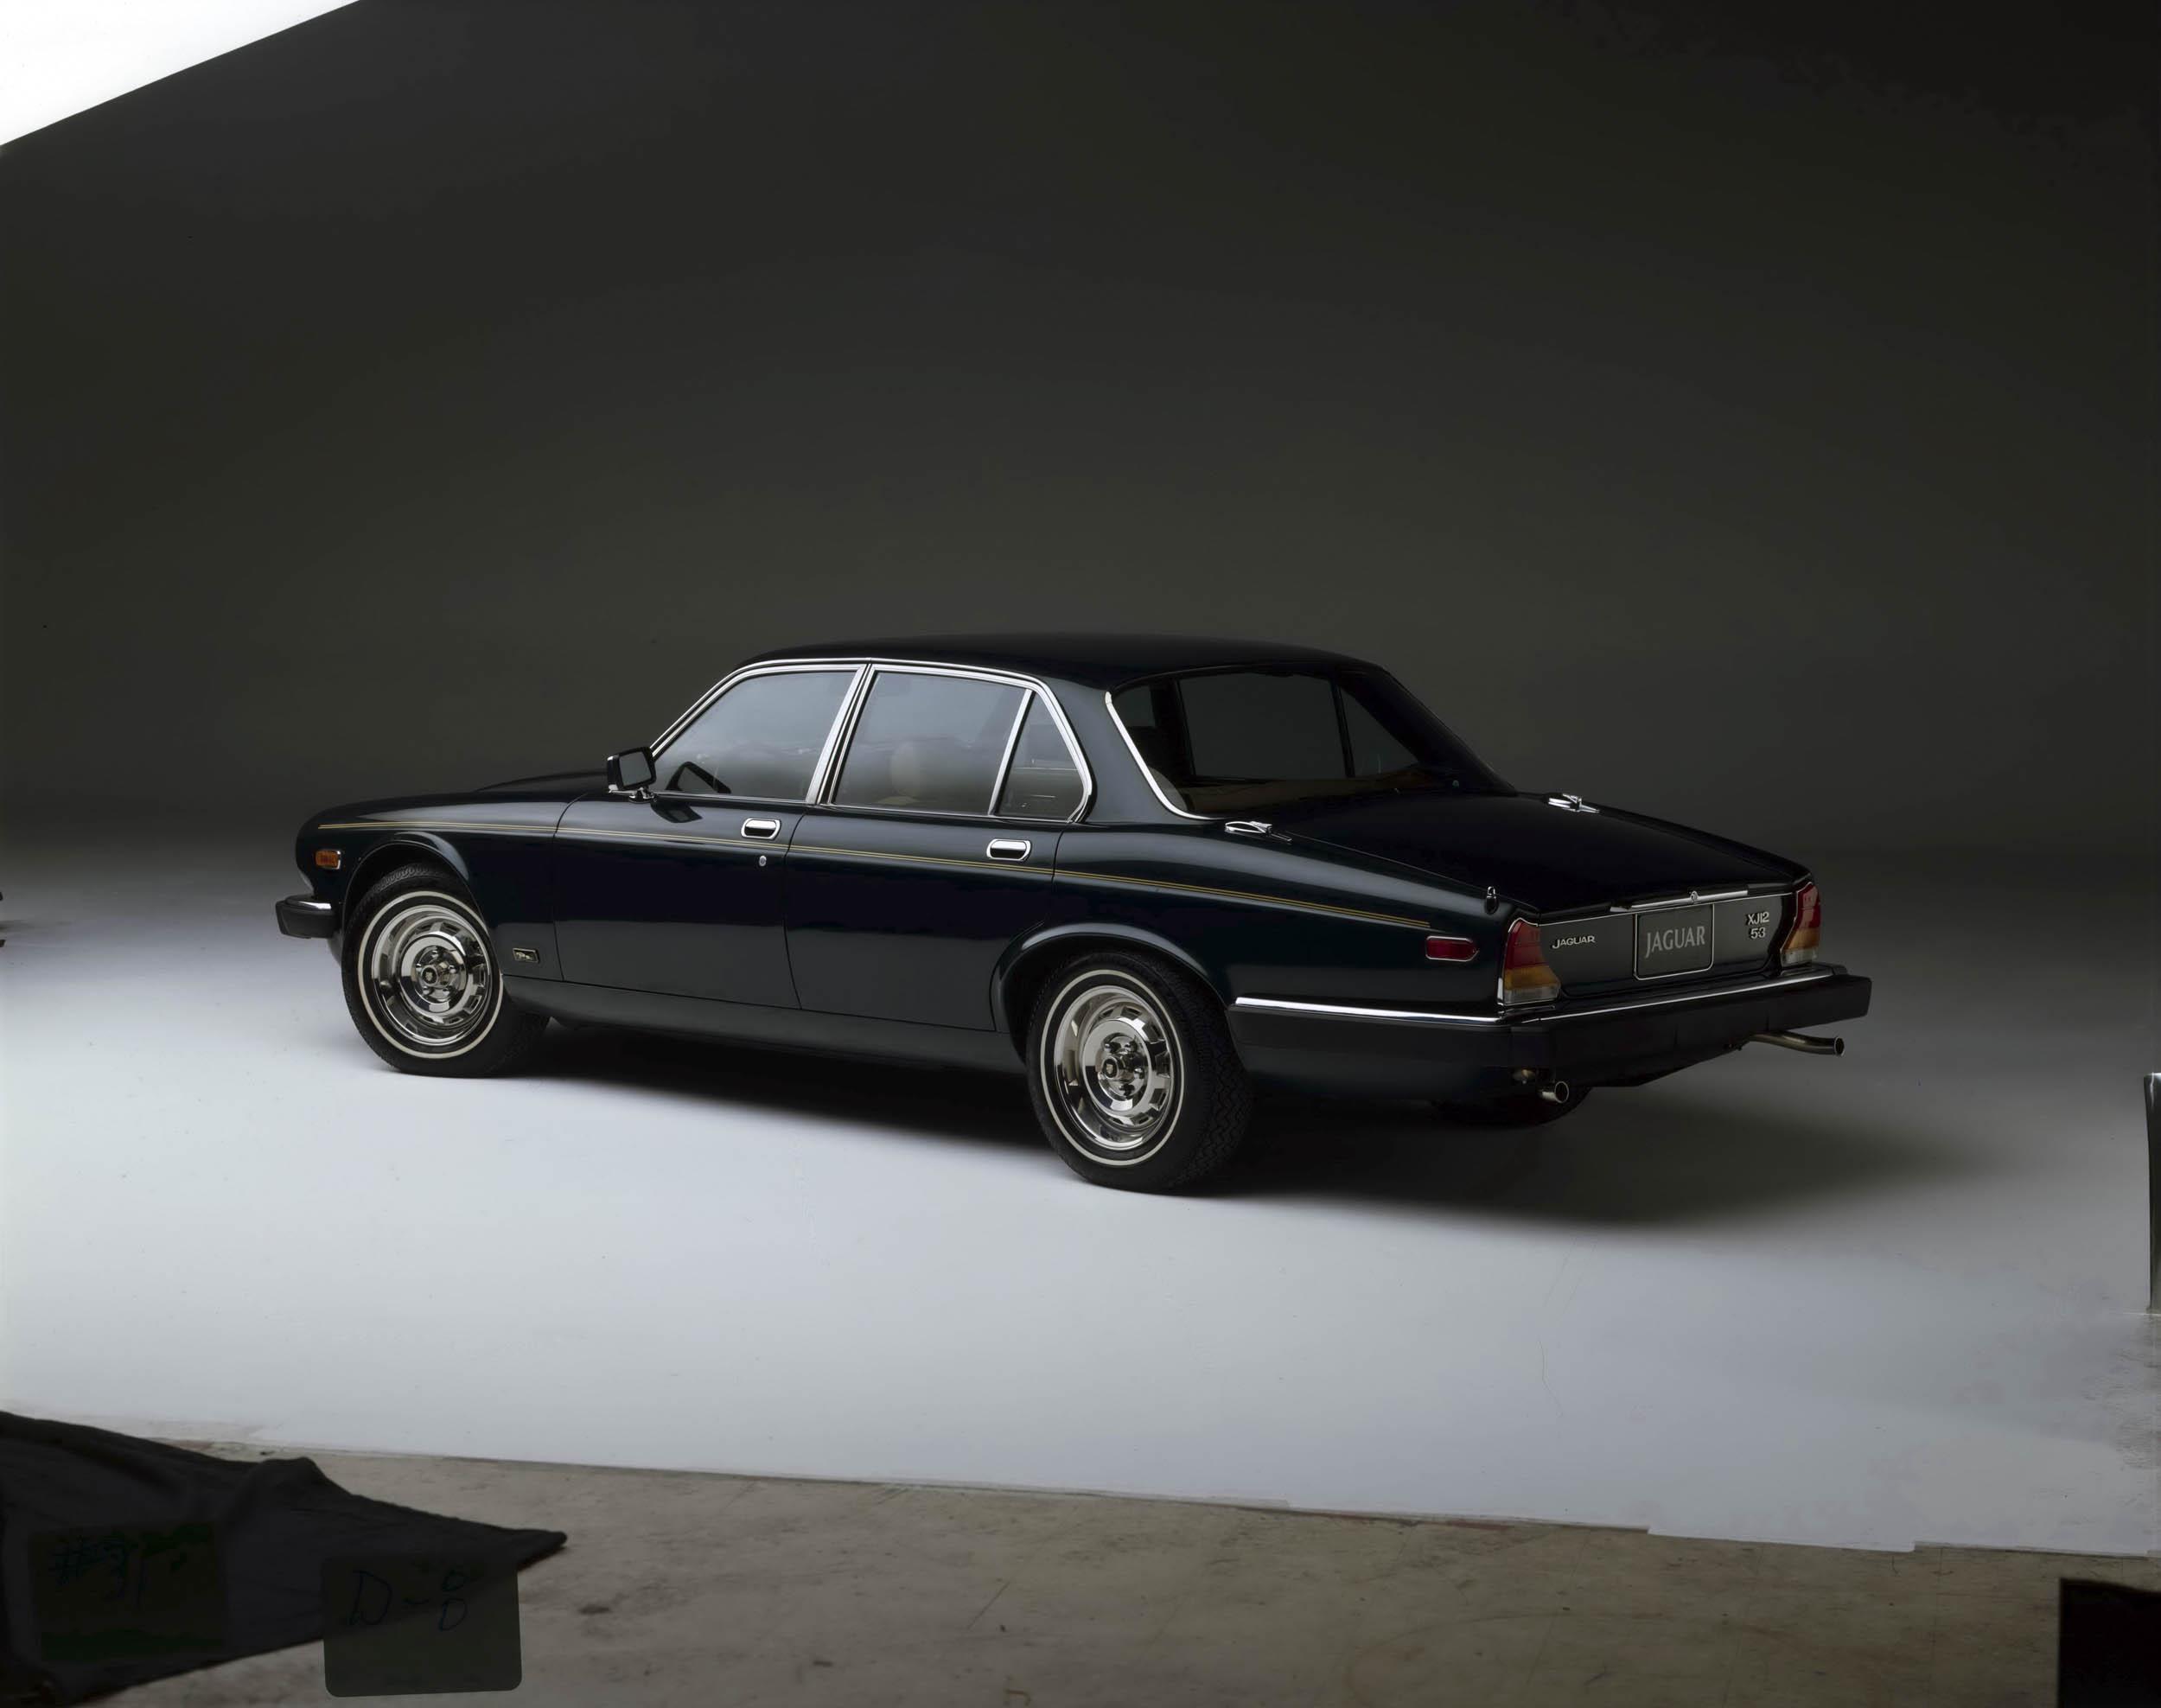 Series III XJ12